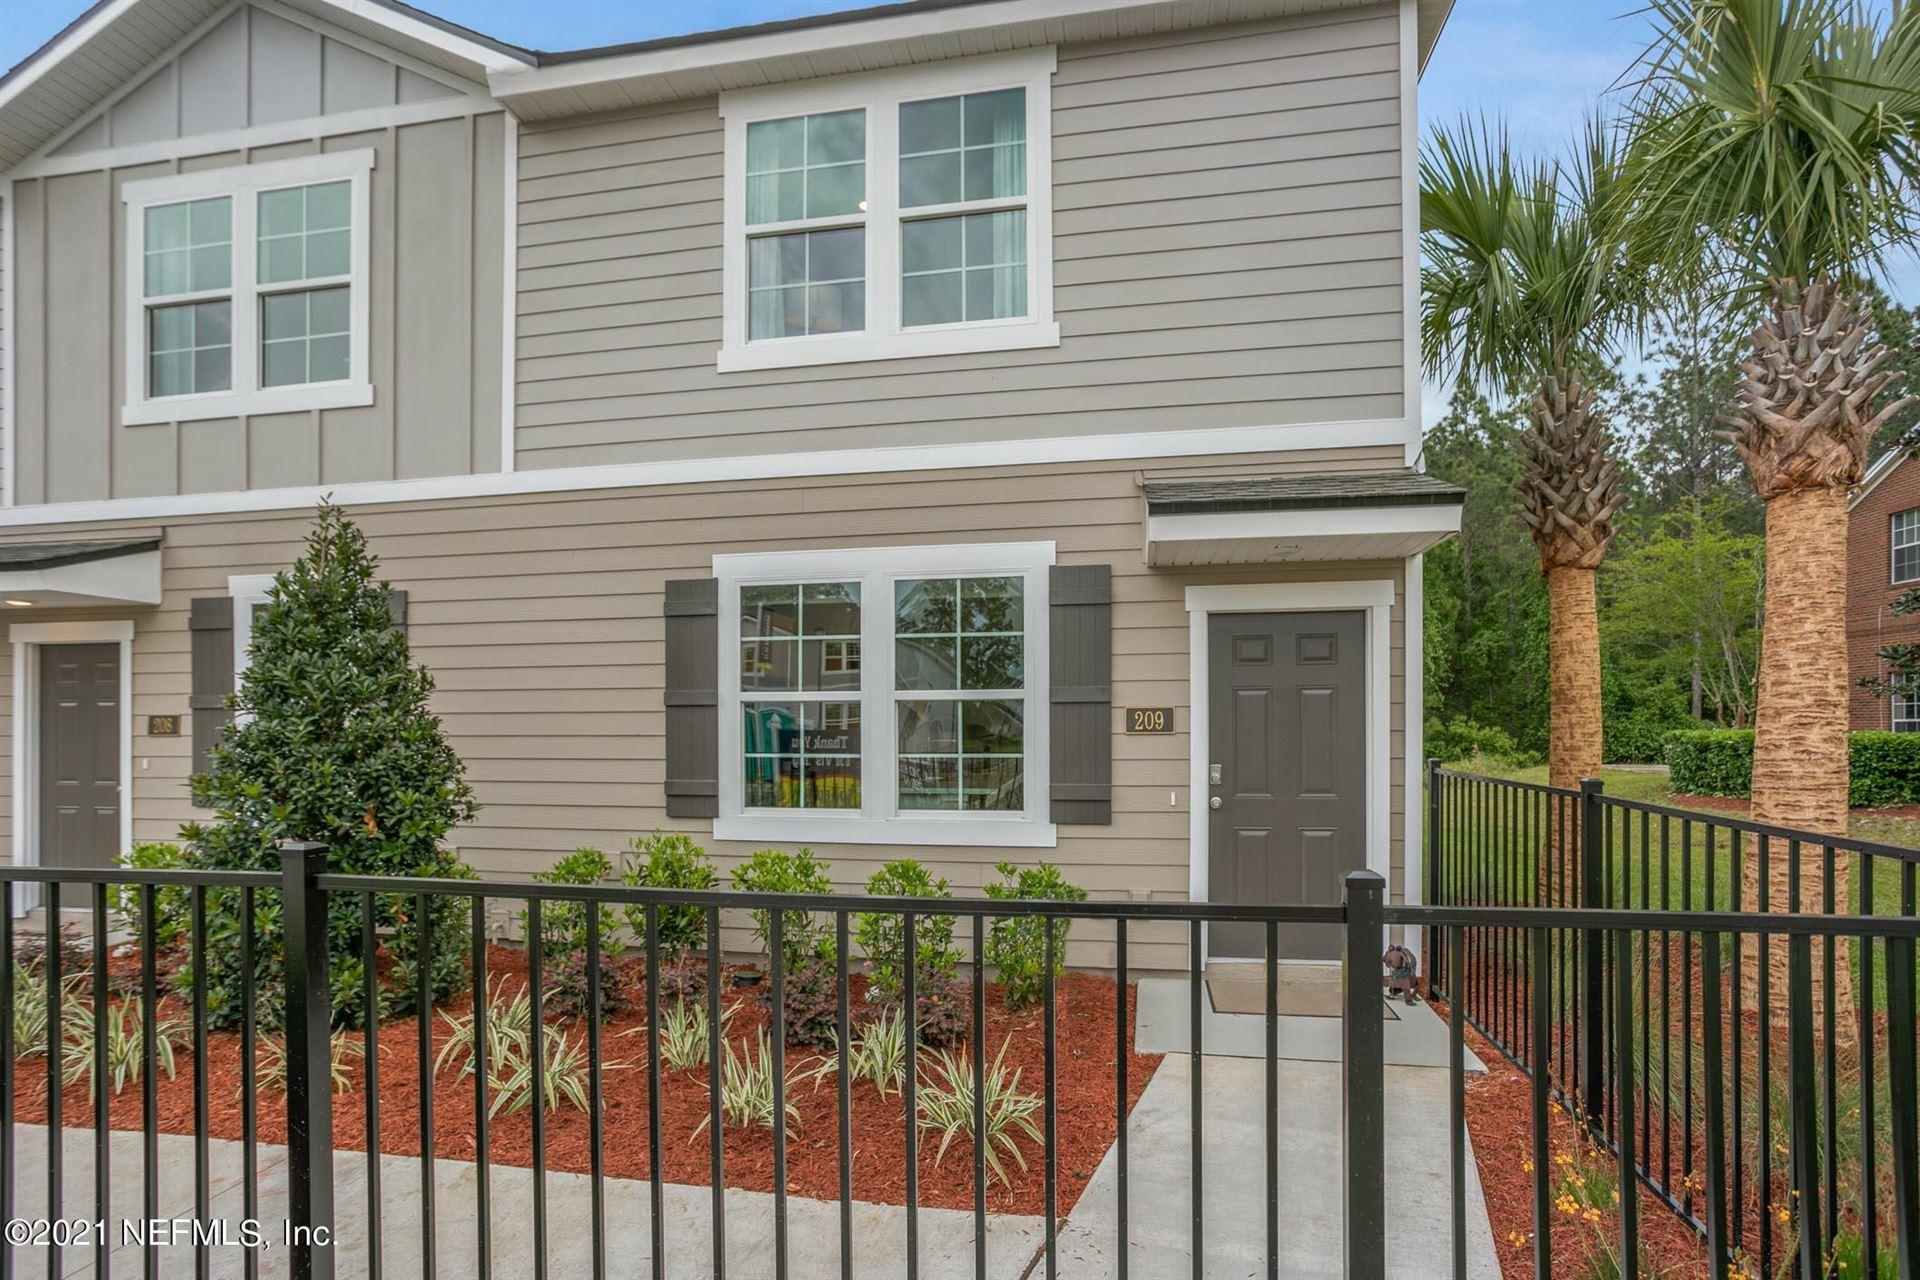 868 ROTARY RD #Lot No: 16, Jacksonville, FL 32211 - MLS#: 1109846